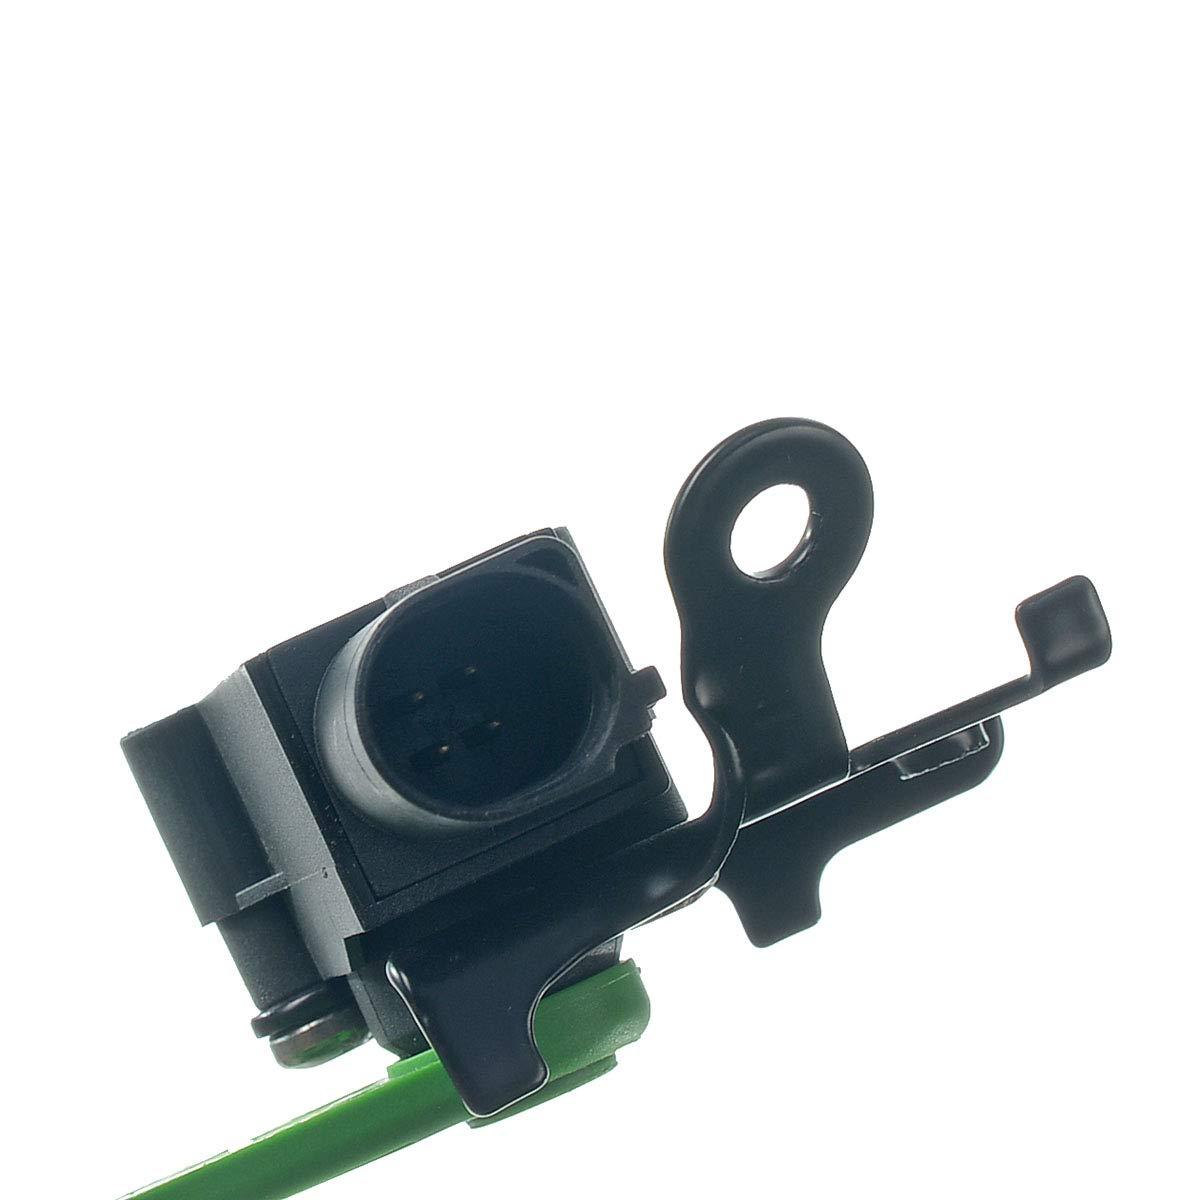 Niveausensor mit Gest/änge Luftfederung vorne links f/ür A6 Avant 4G5 C7 2011-2018 4H0941285G